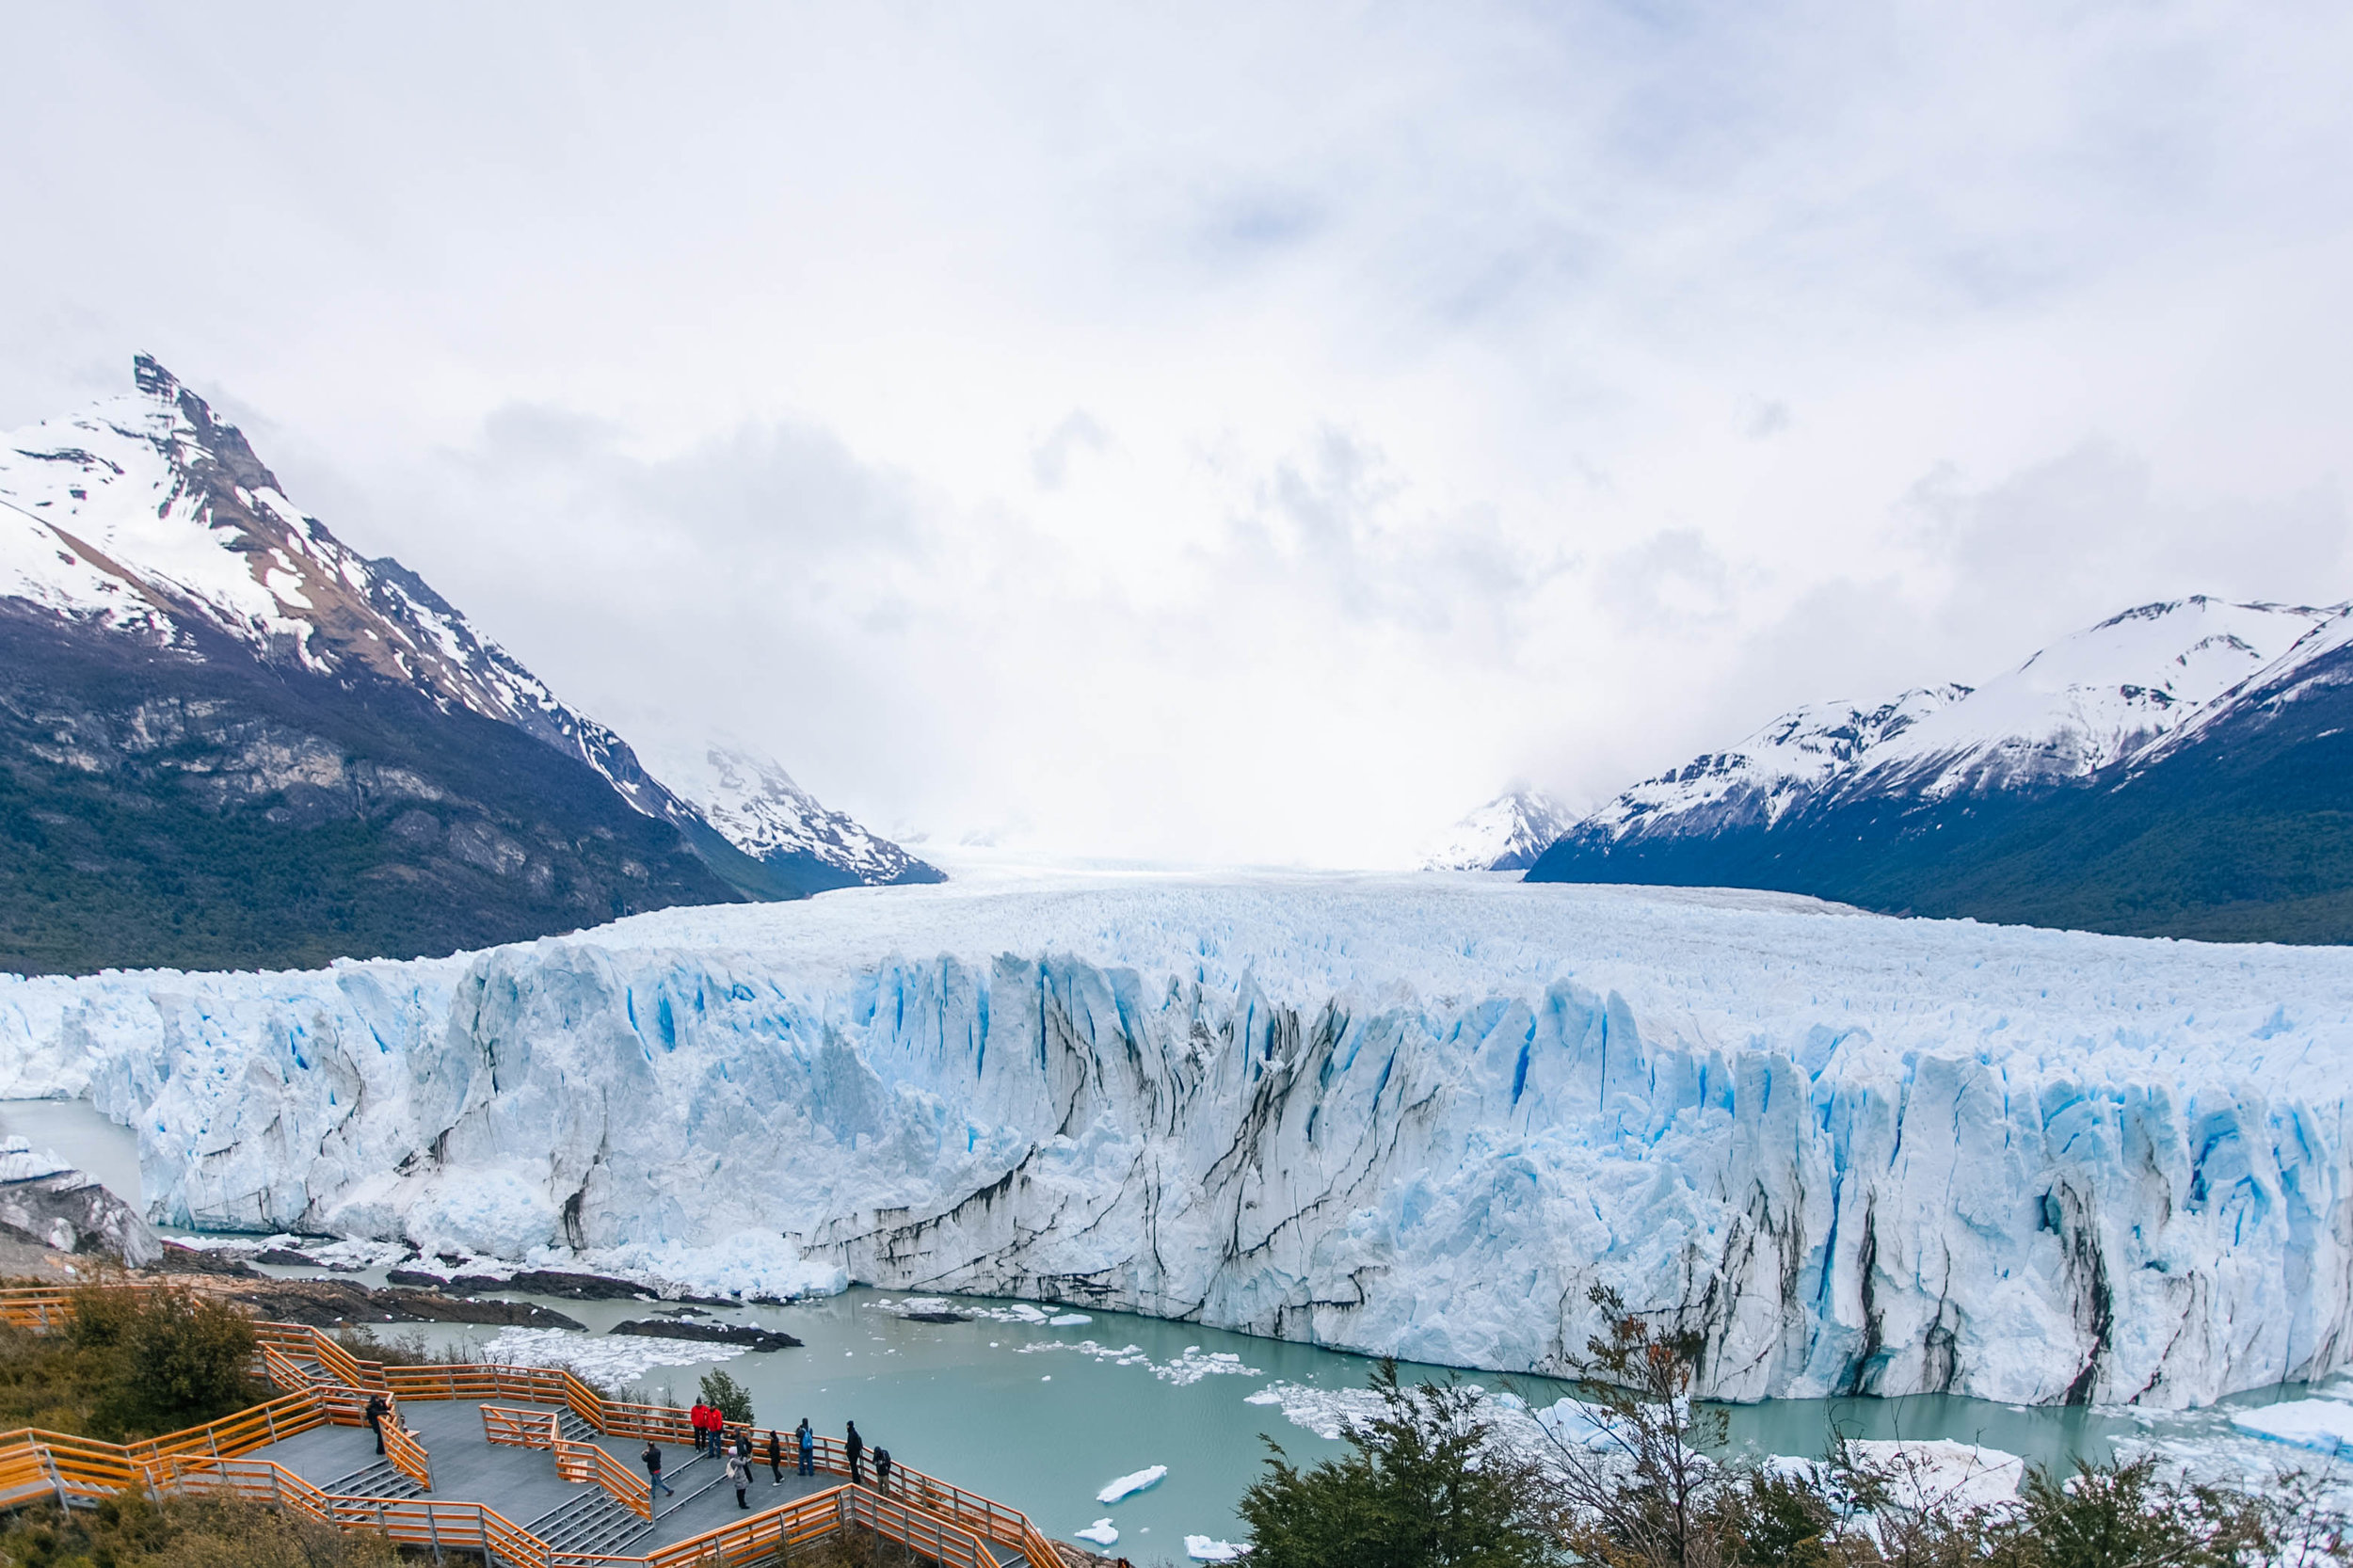 perito moreno patagonia argentina 10.jpg